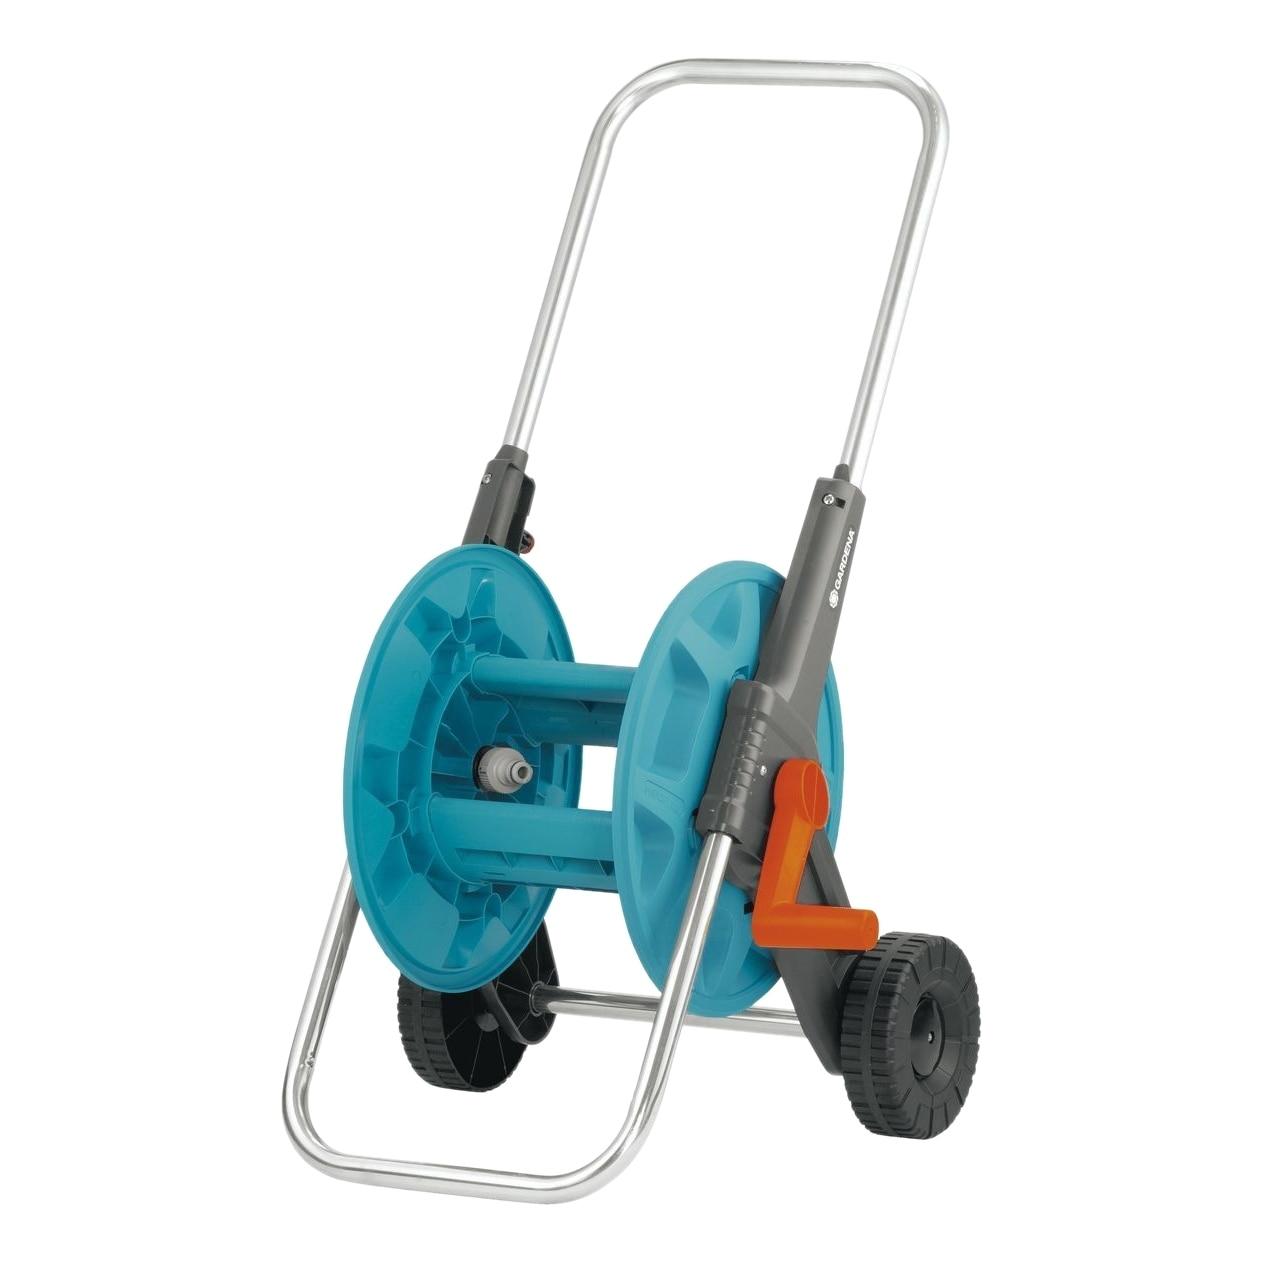 Set поливочный GARDENA 18502-20.000.00 (Hose 20 m, tip for watering, height adjustment, protection from течи) hose watering gardena 18099 2000000